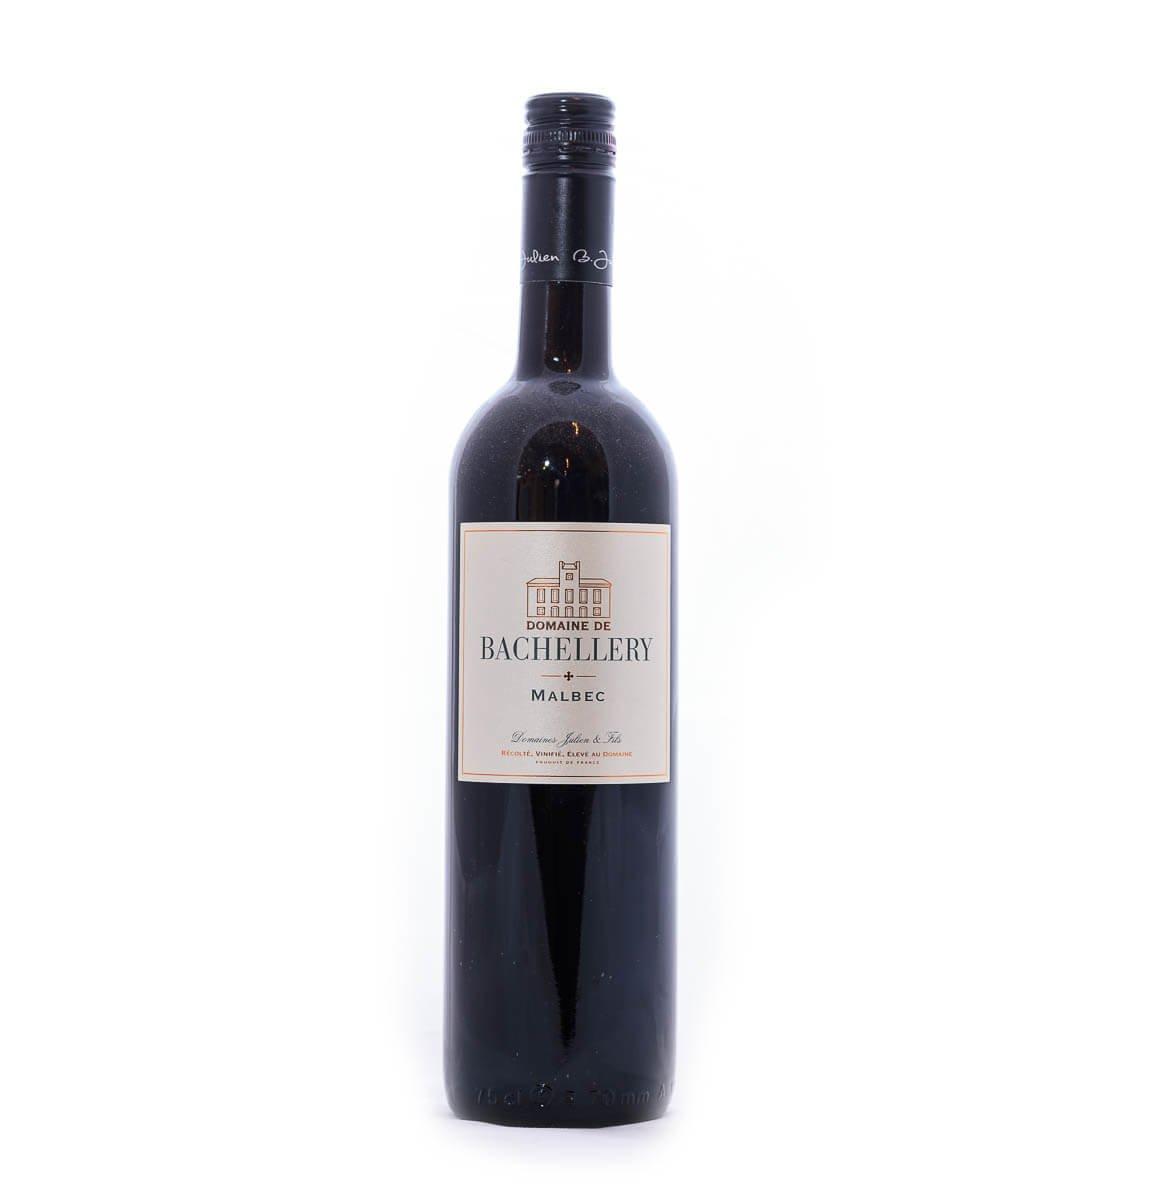 Bachellery malbec red wine